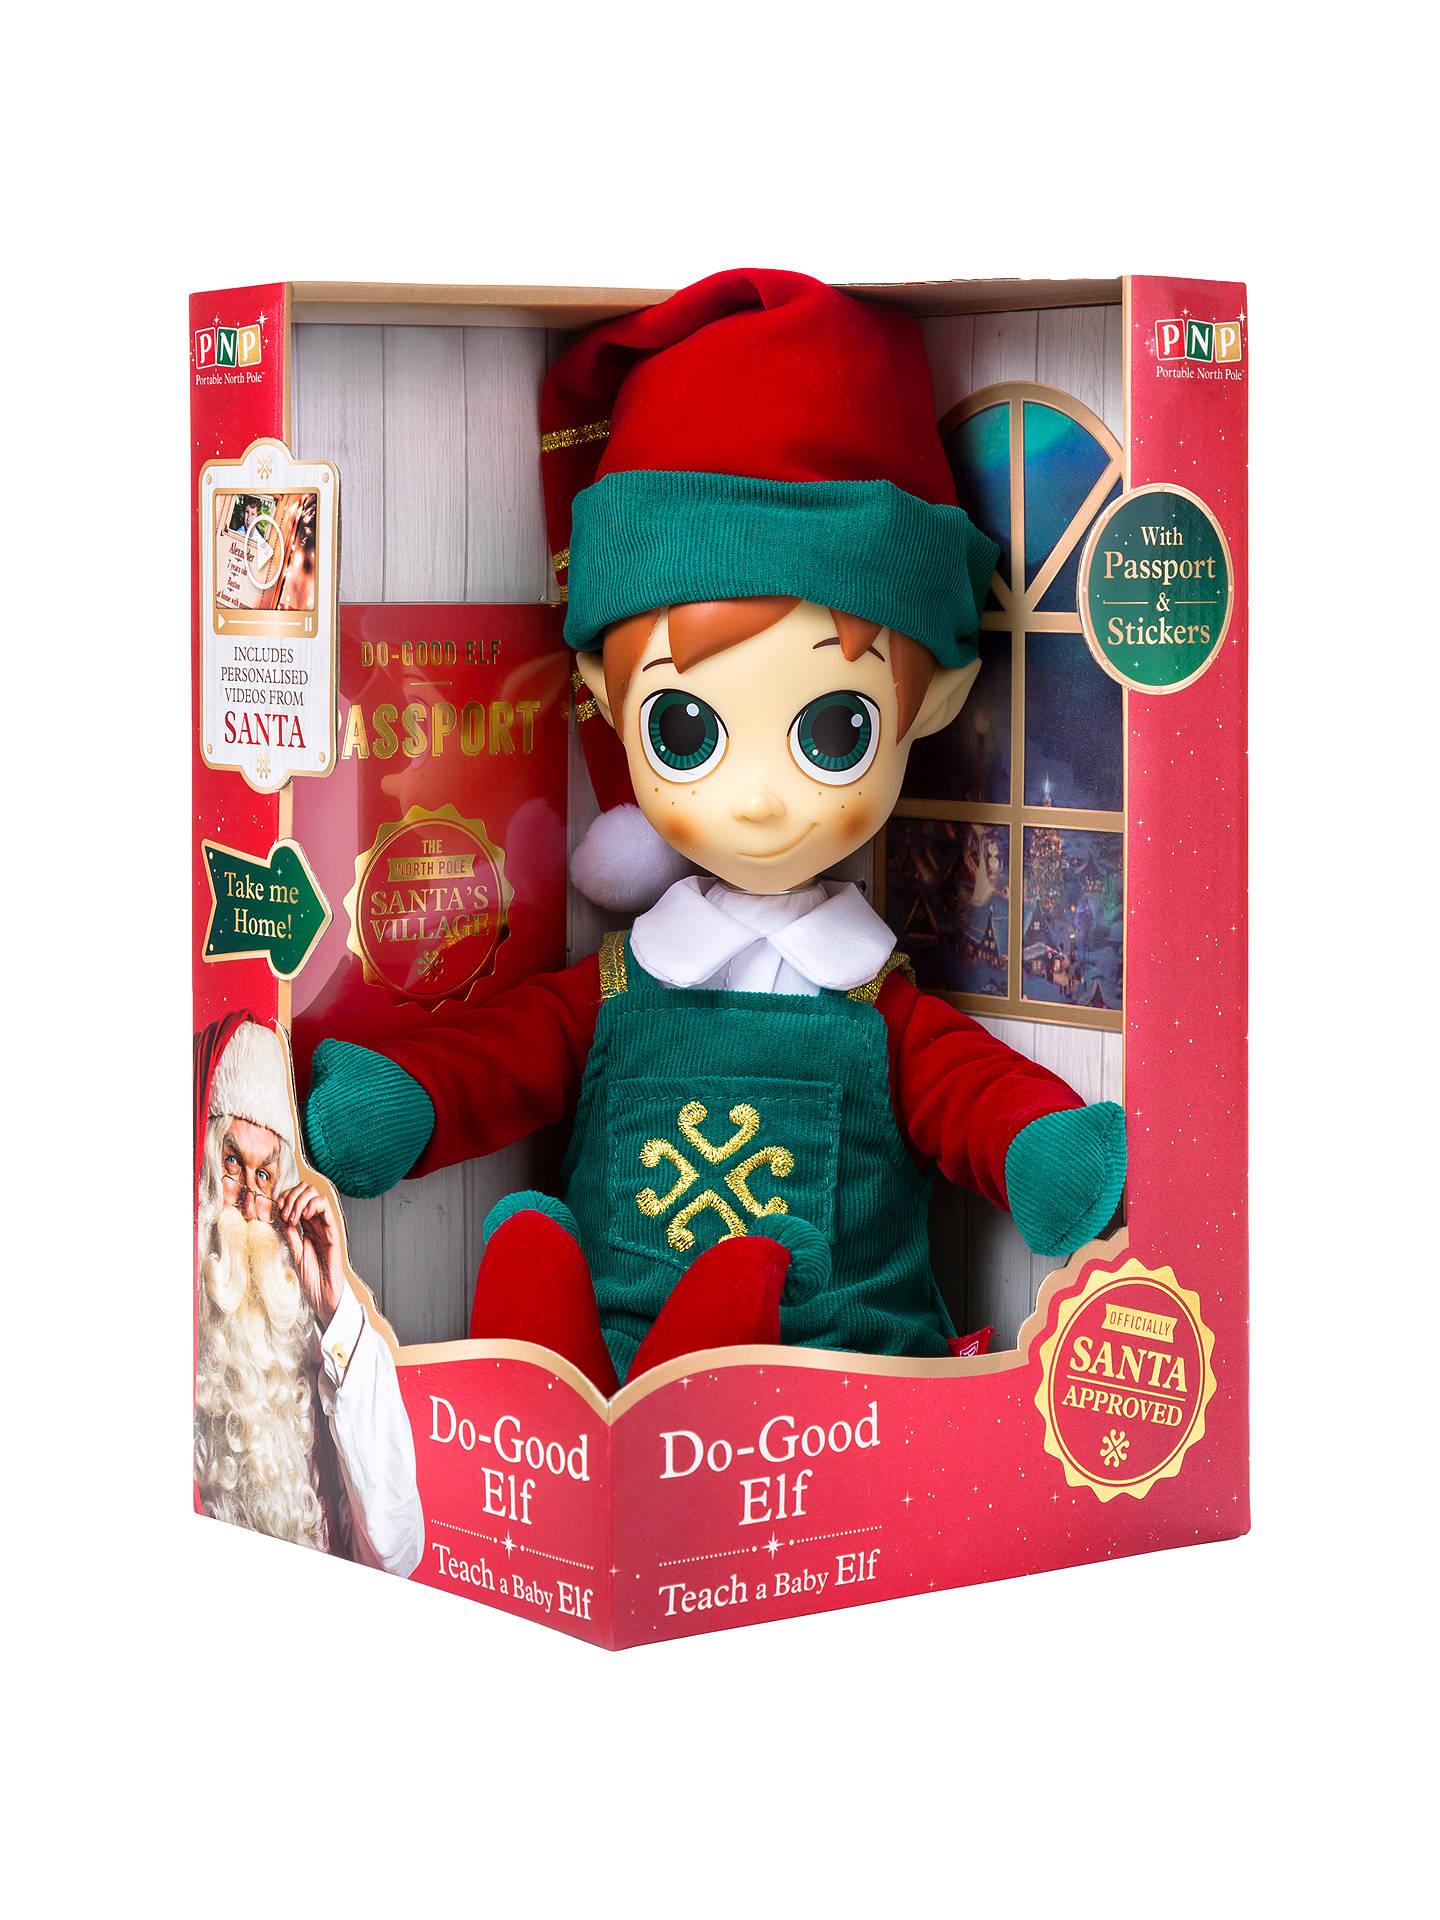 b06cfb38d2bd6 Buy Portable North Pole Do-Good Elf Online at johnlewis.com